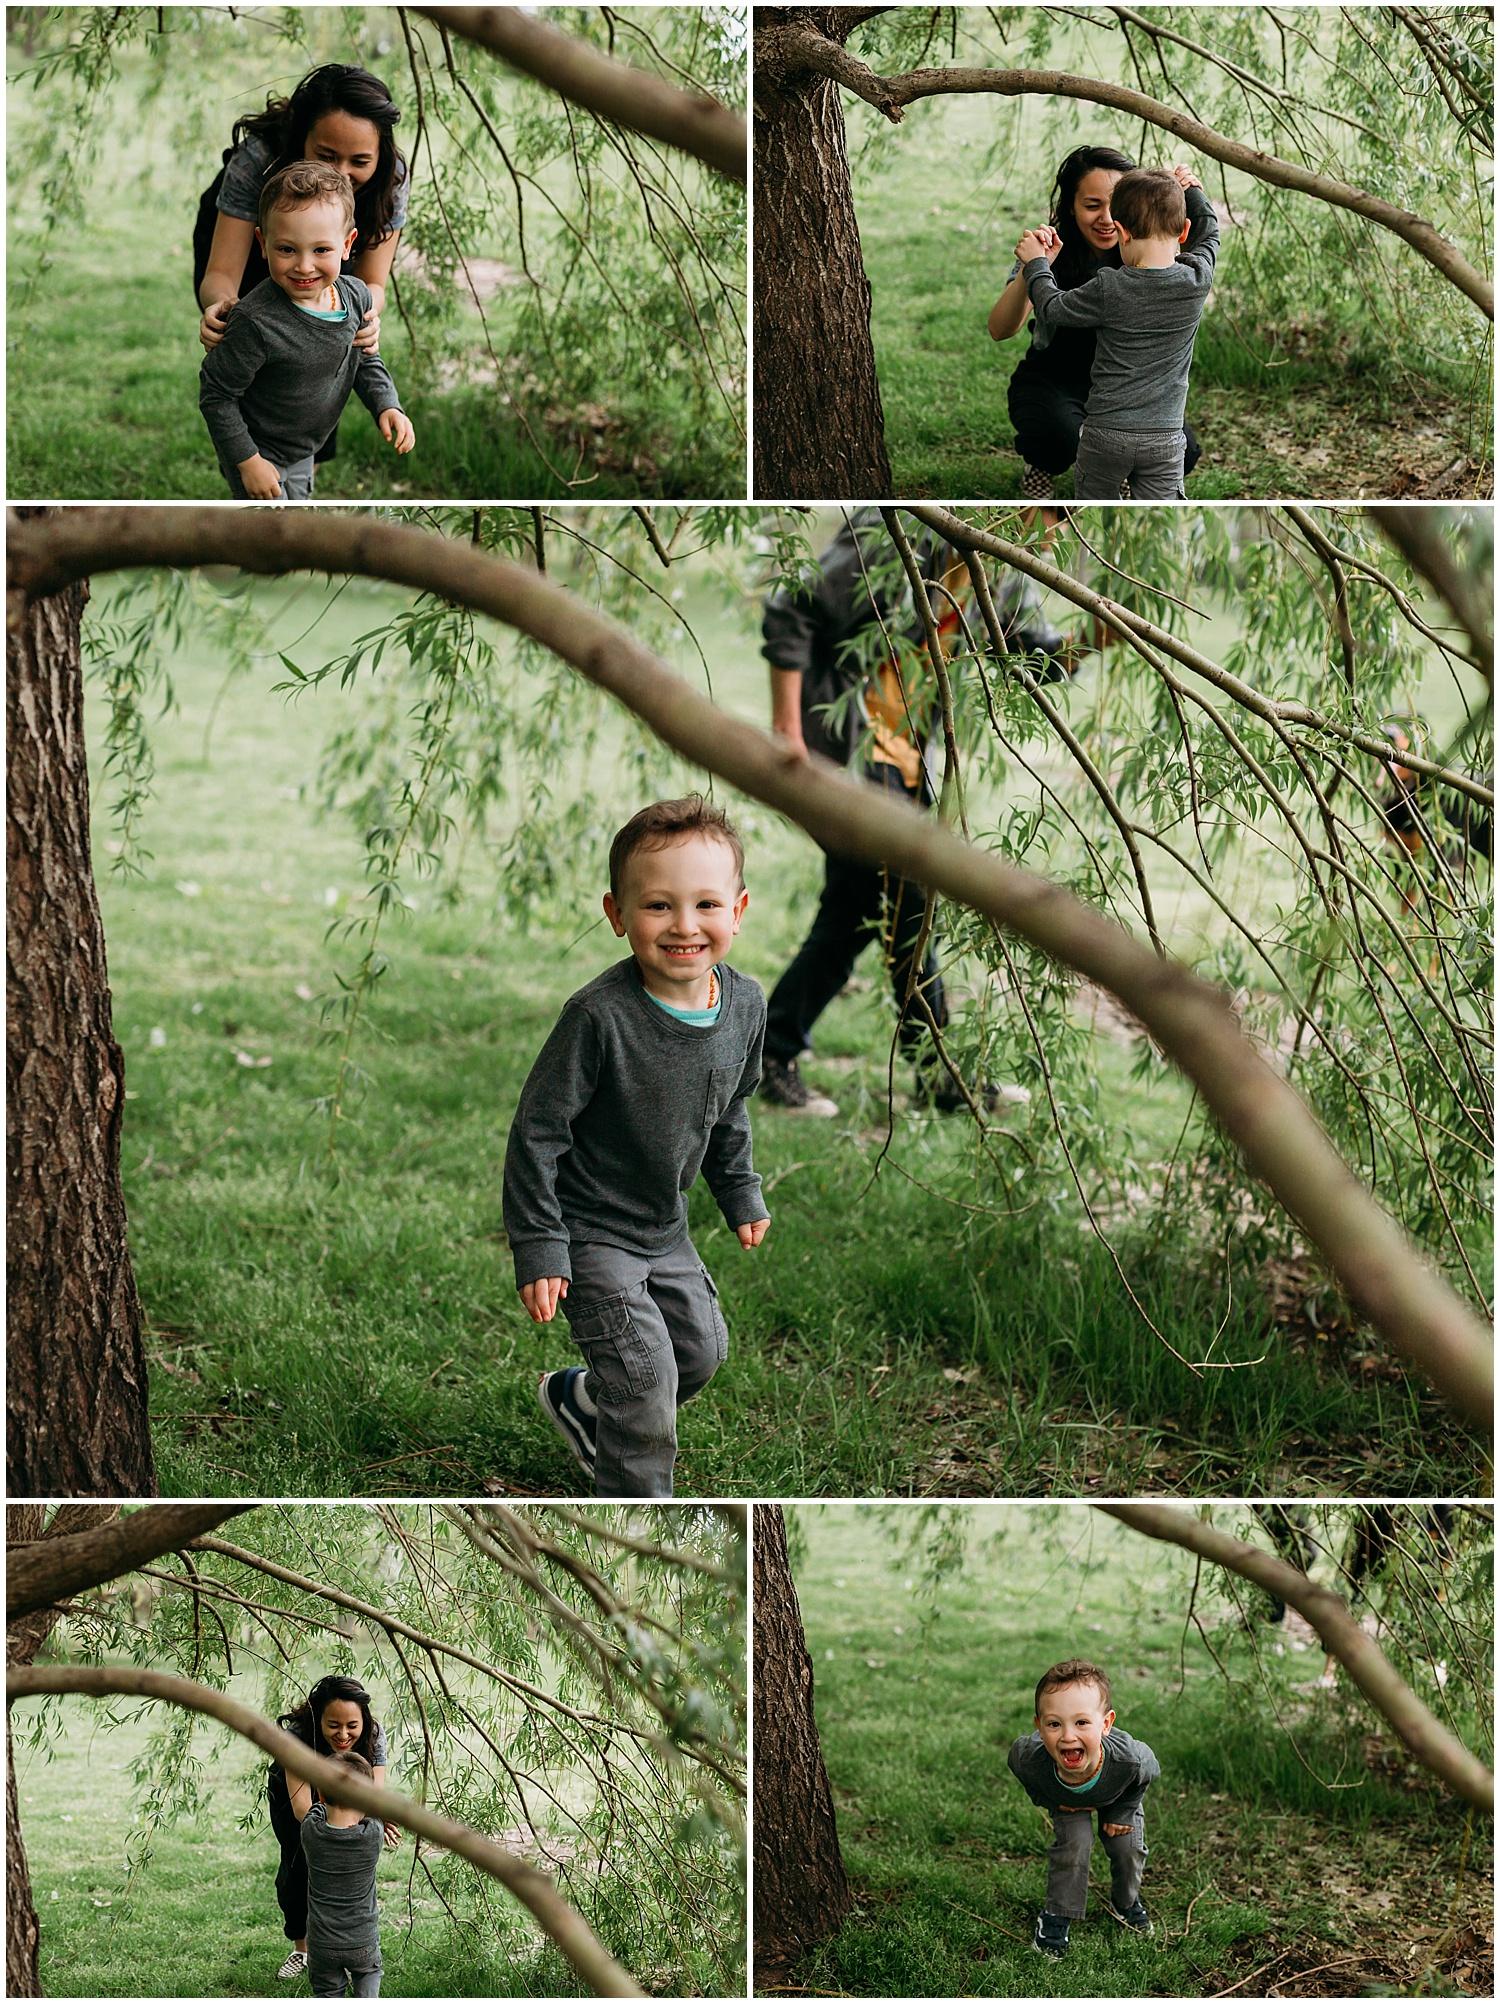 collingswood-new-jersey-motherhood-mini-photo-session_0019.jpg